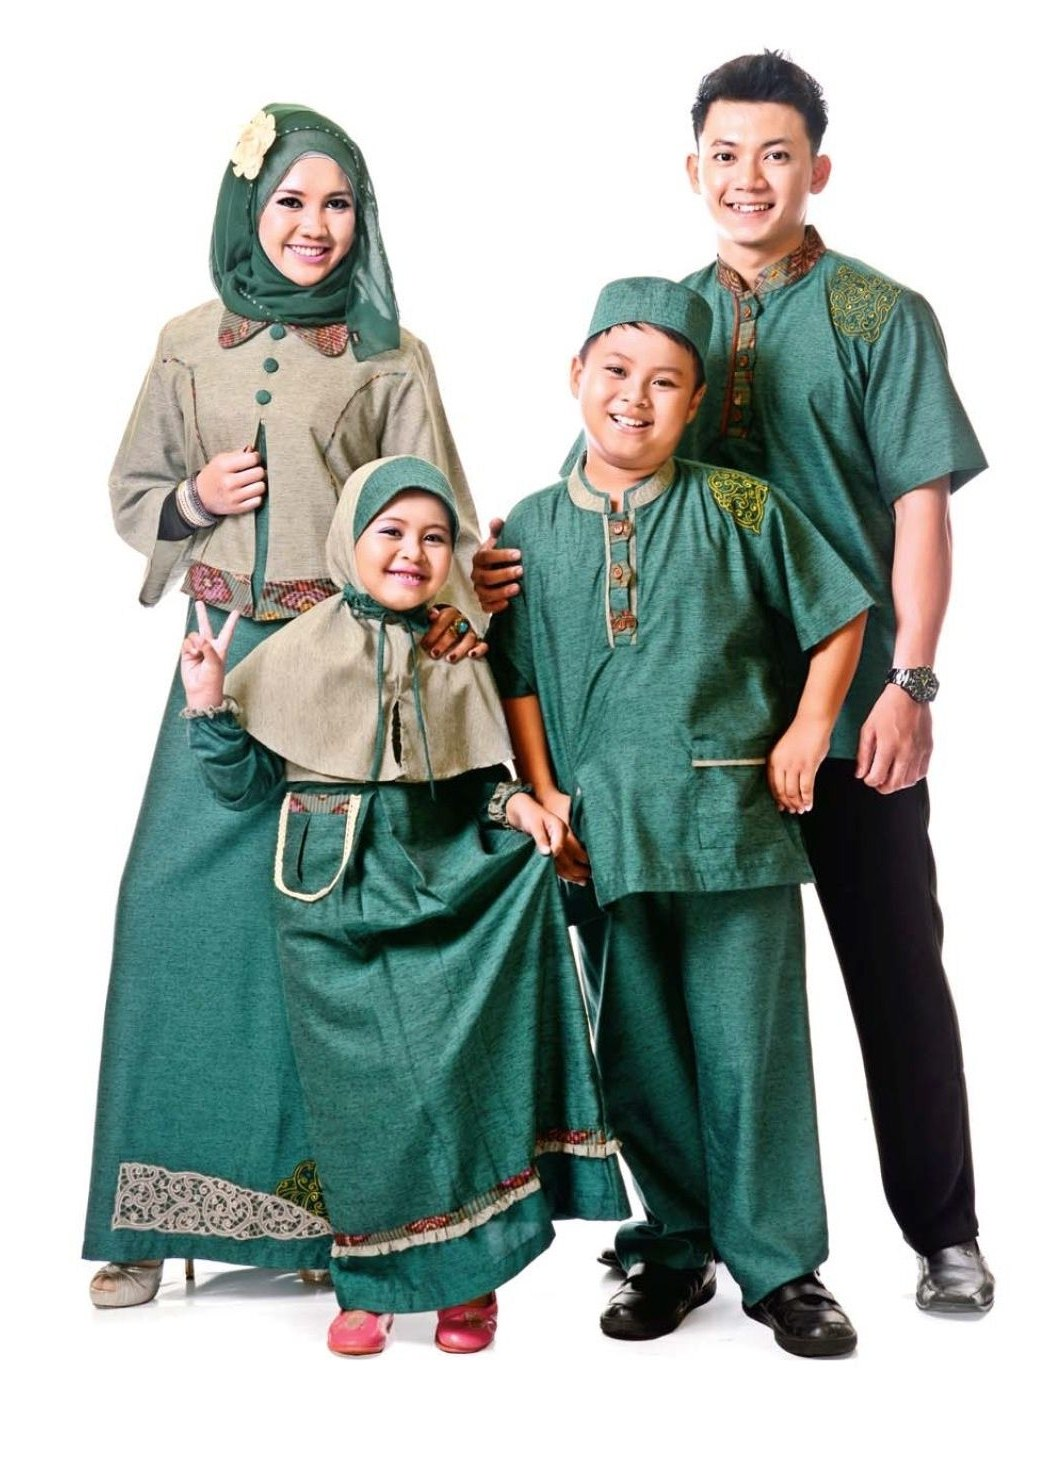 Bentuk Baju Lebaran Keluarga 2018 Etdg Baju Lebaran Keluarga 2016